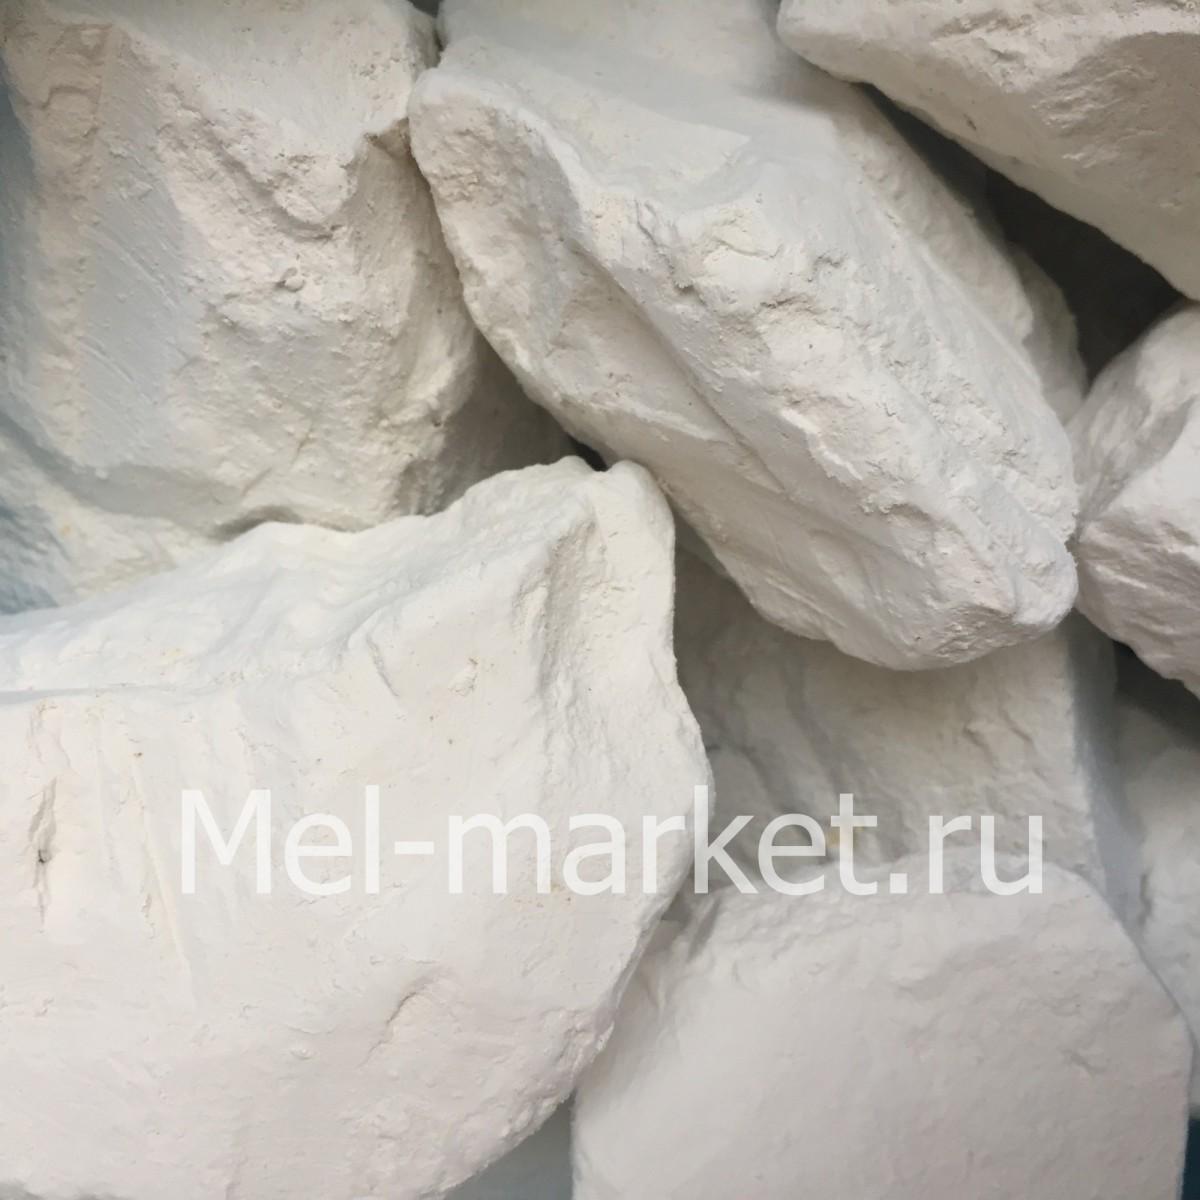 "Мел ""Новый Оскол"" - 100гр"